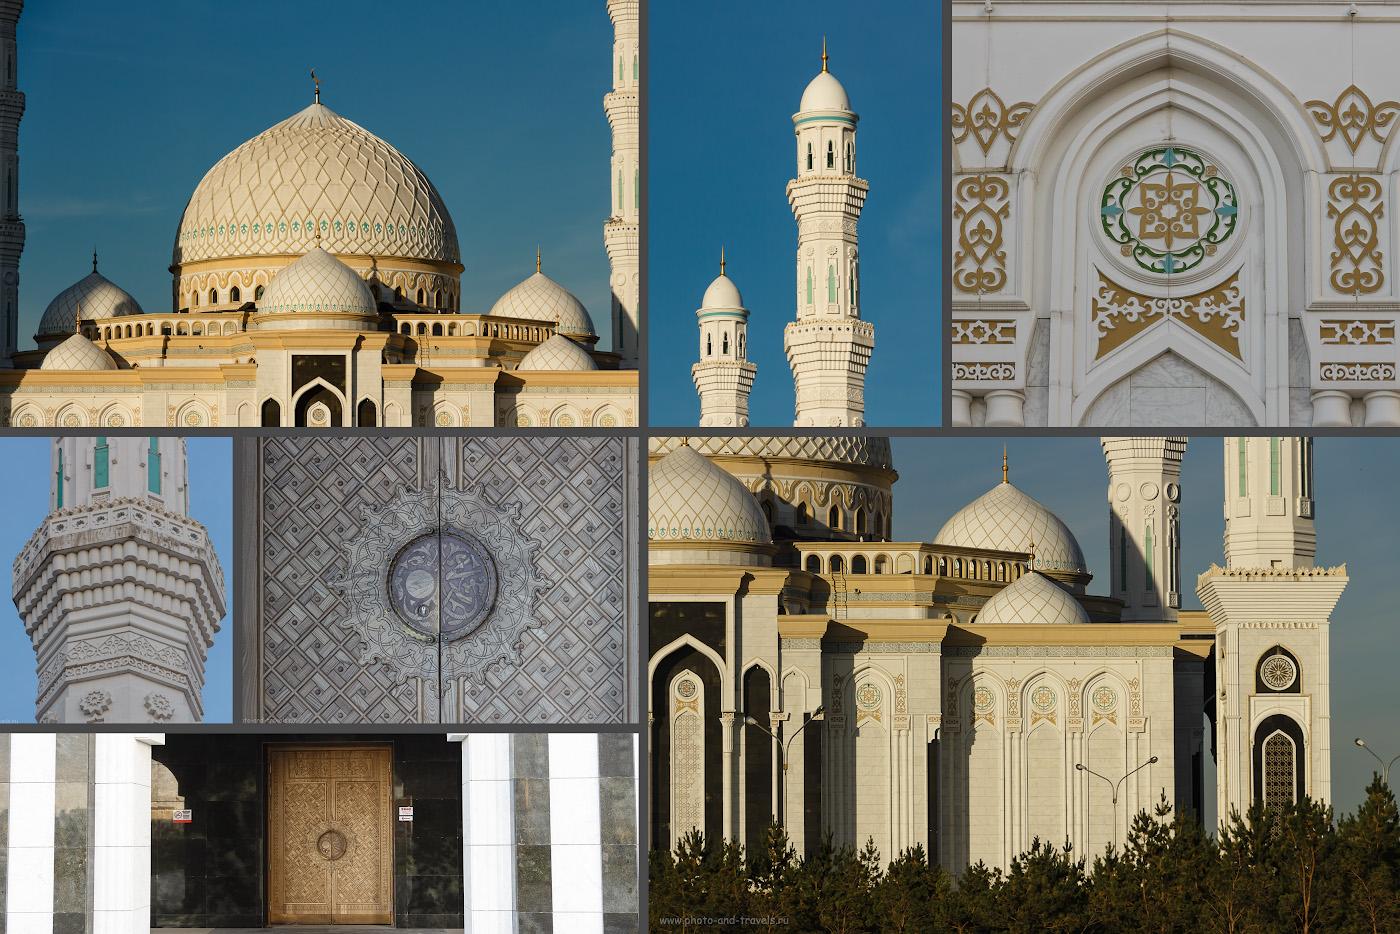 Фото 23. Самая красивая мечеть Астаны – мечеть «Хазрет Султан».